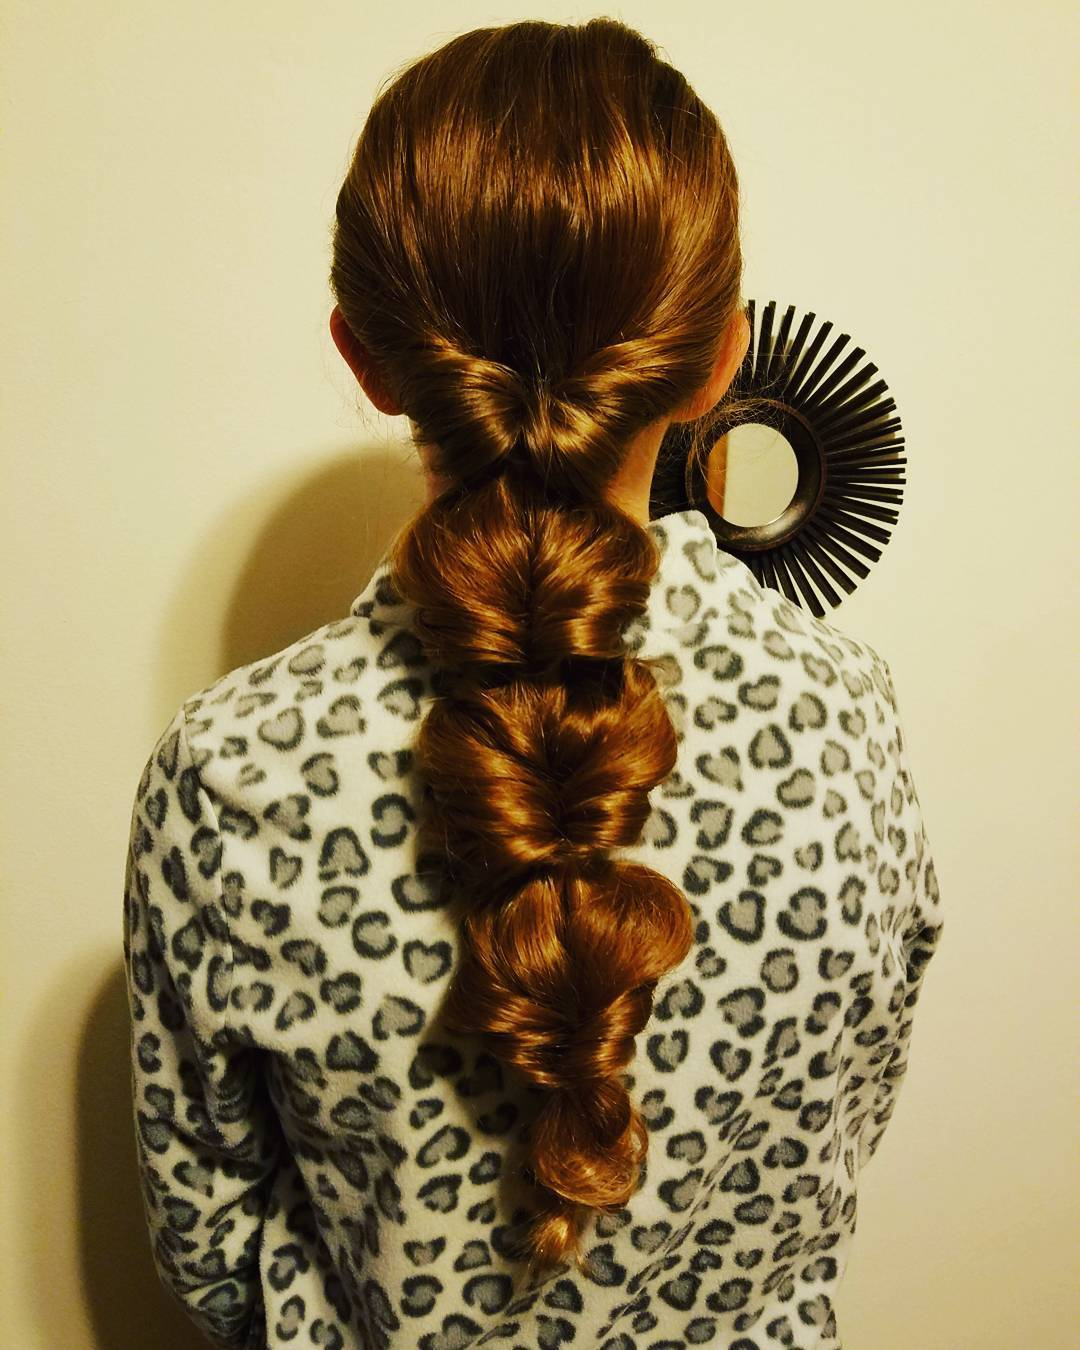 hardyhairstyles-flipthrough-long-hairstyle